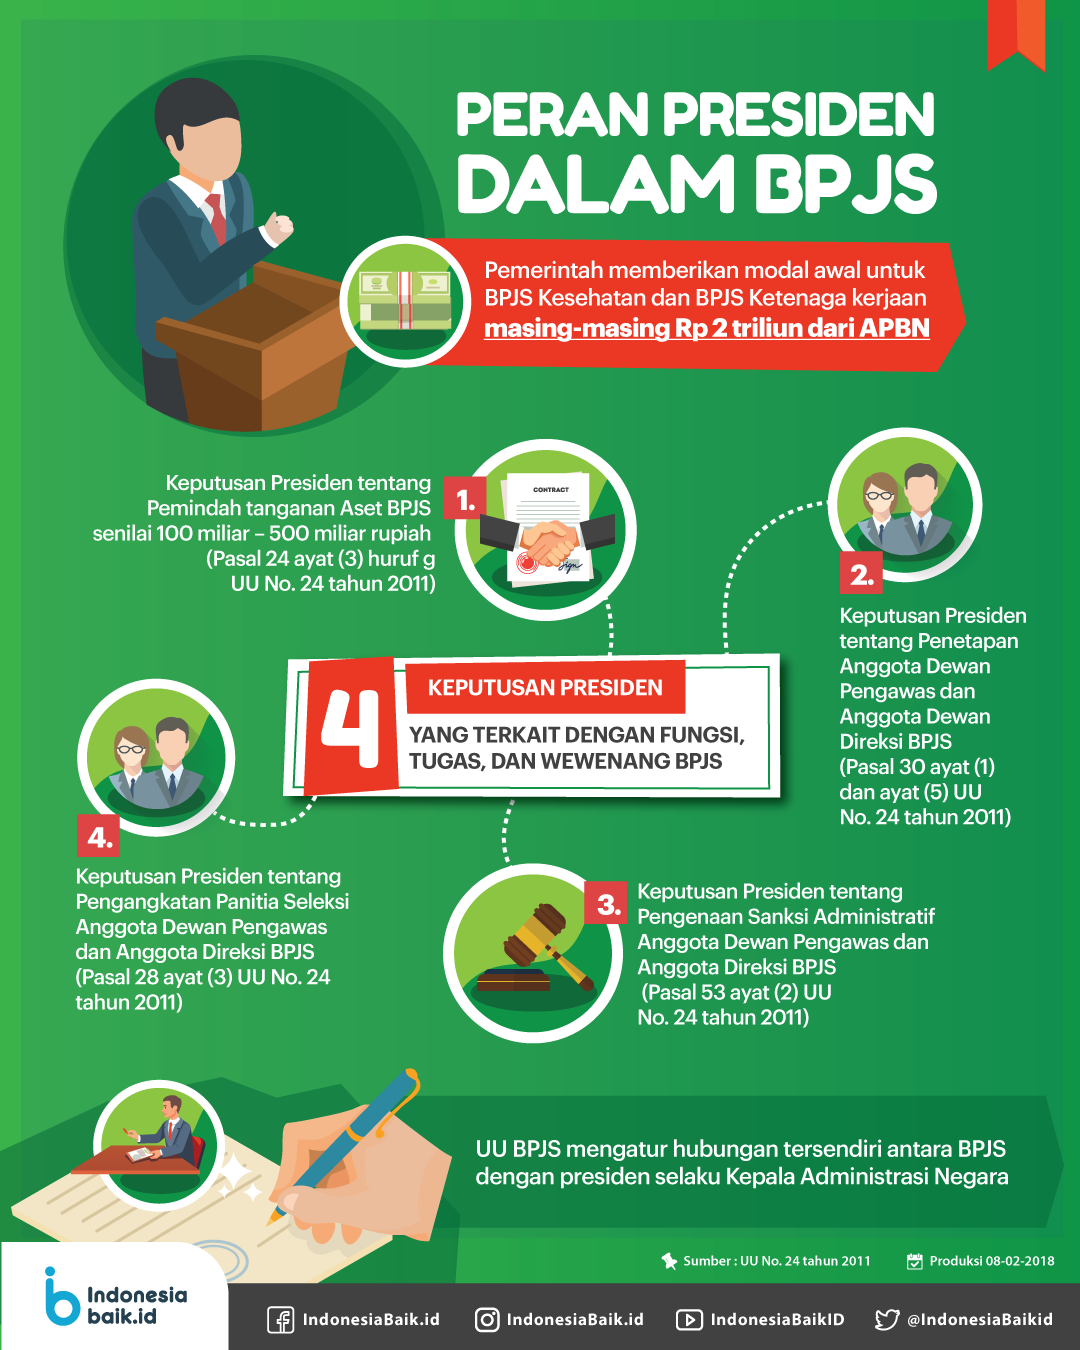 Peran Presiden Dalam BPJS